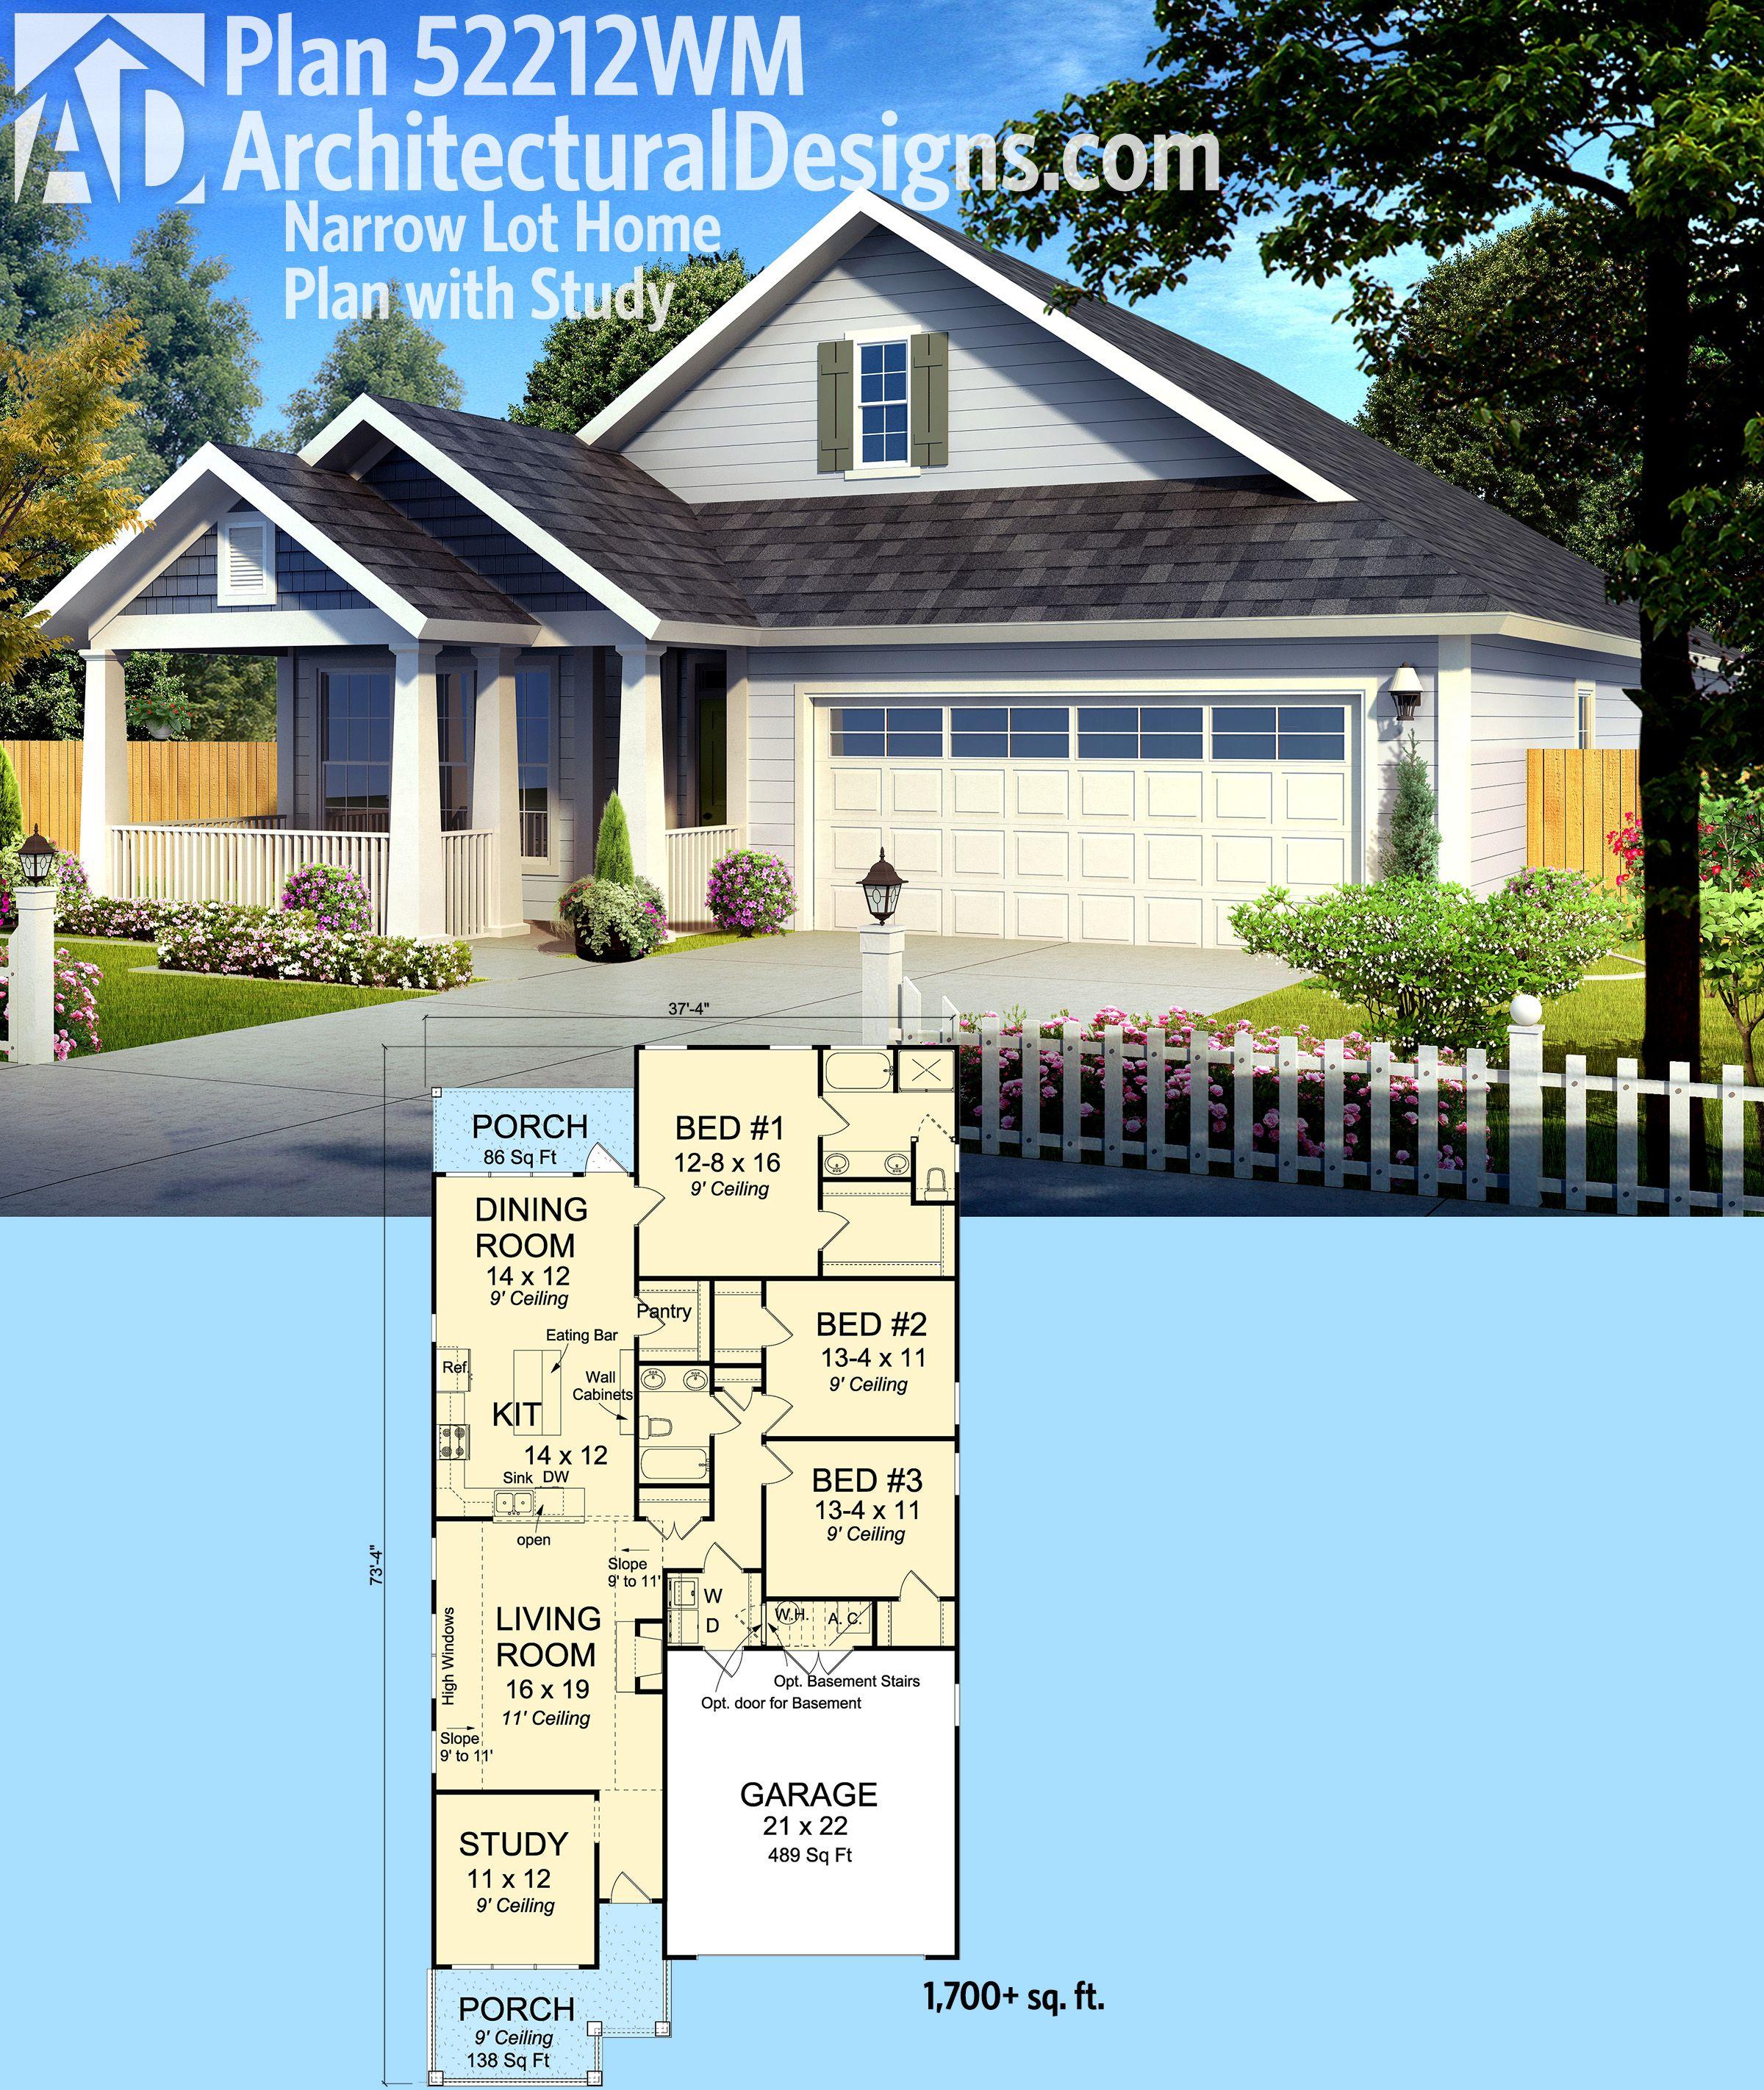 Plan 52212wm Narrow Lot Home Plan With Study Narrow House Plans Narrow Lot House Plans Dream House Plans